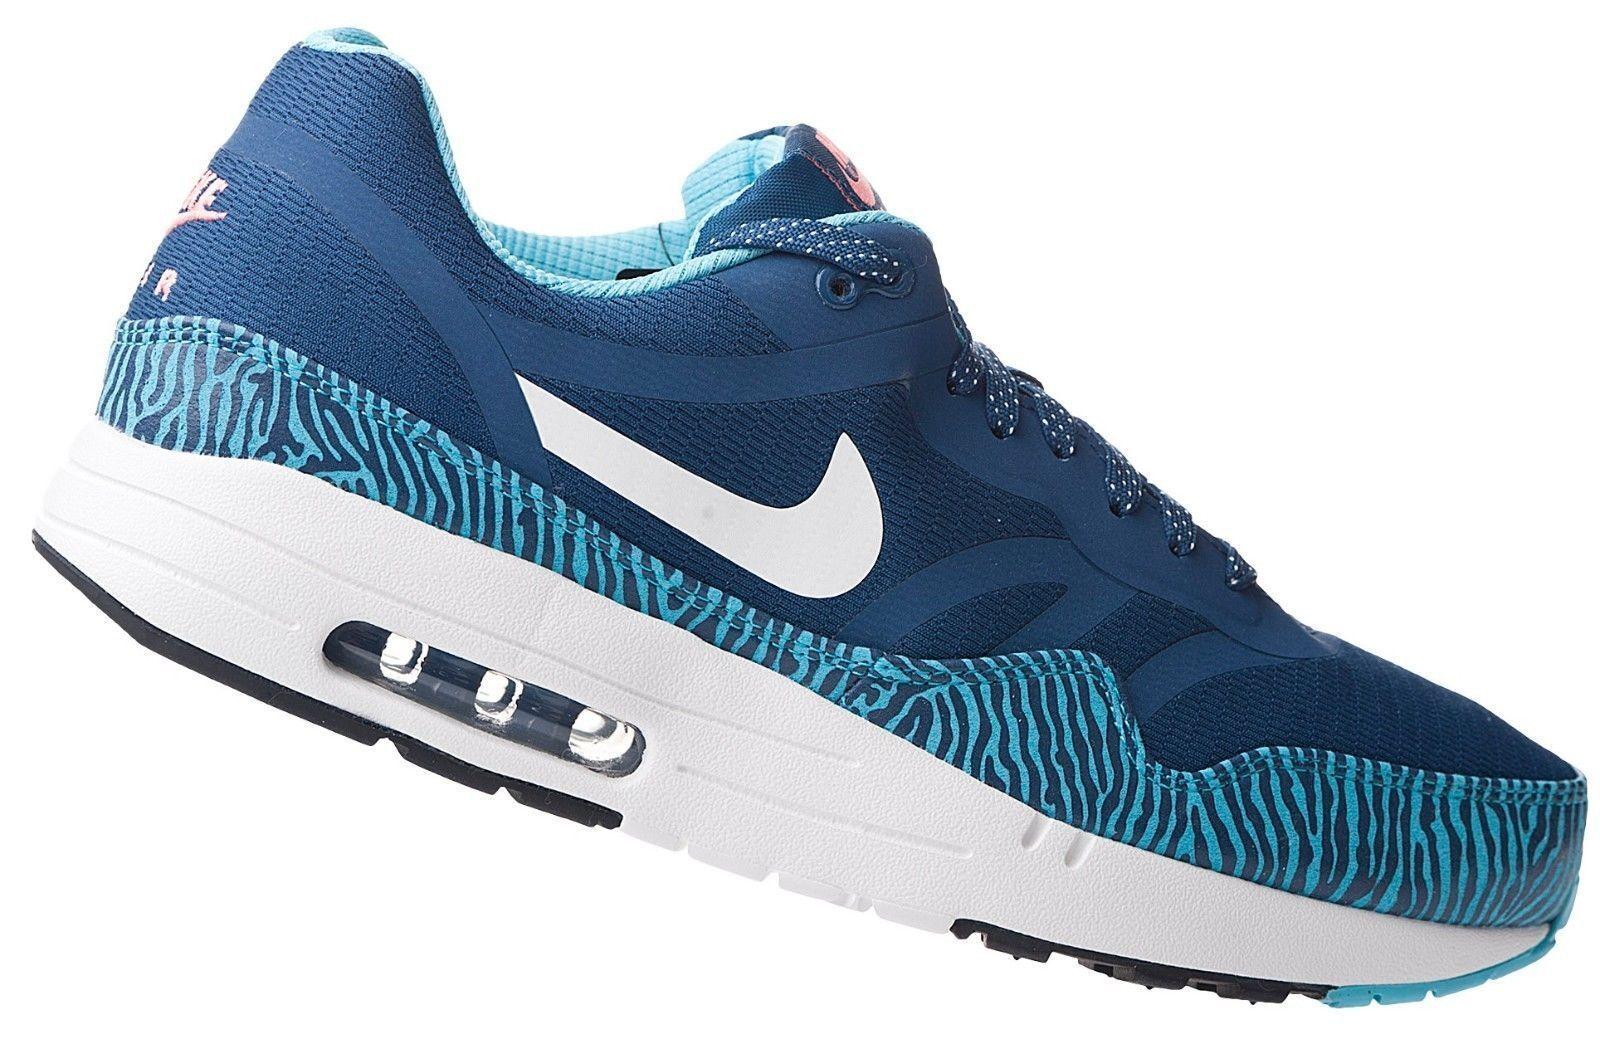 Nike Air Max 1 PRM TAPE Brave Blue & Summit Whit Sz 9.5 599514-410 Mens